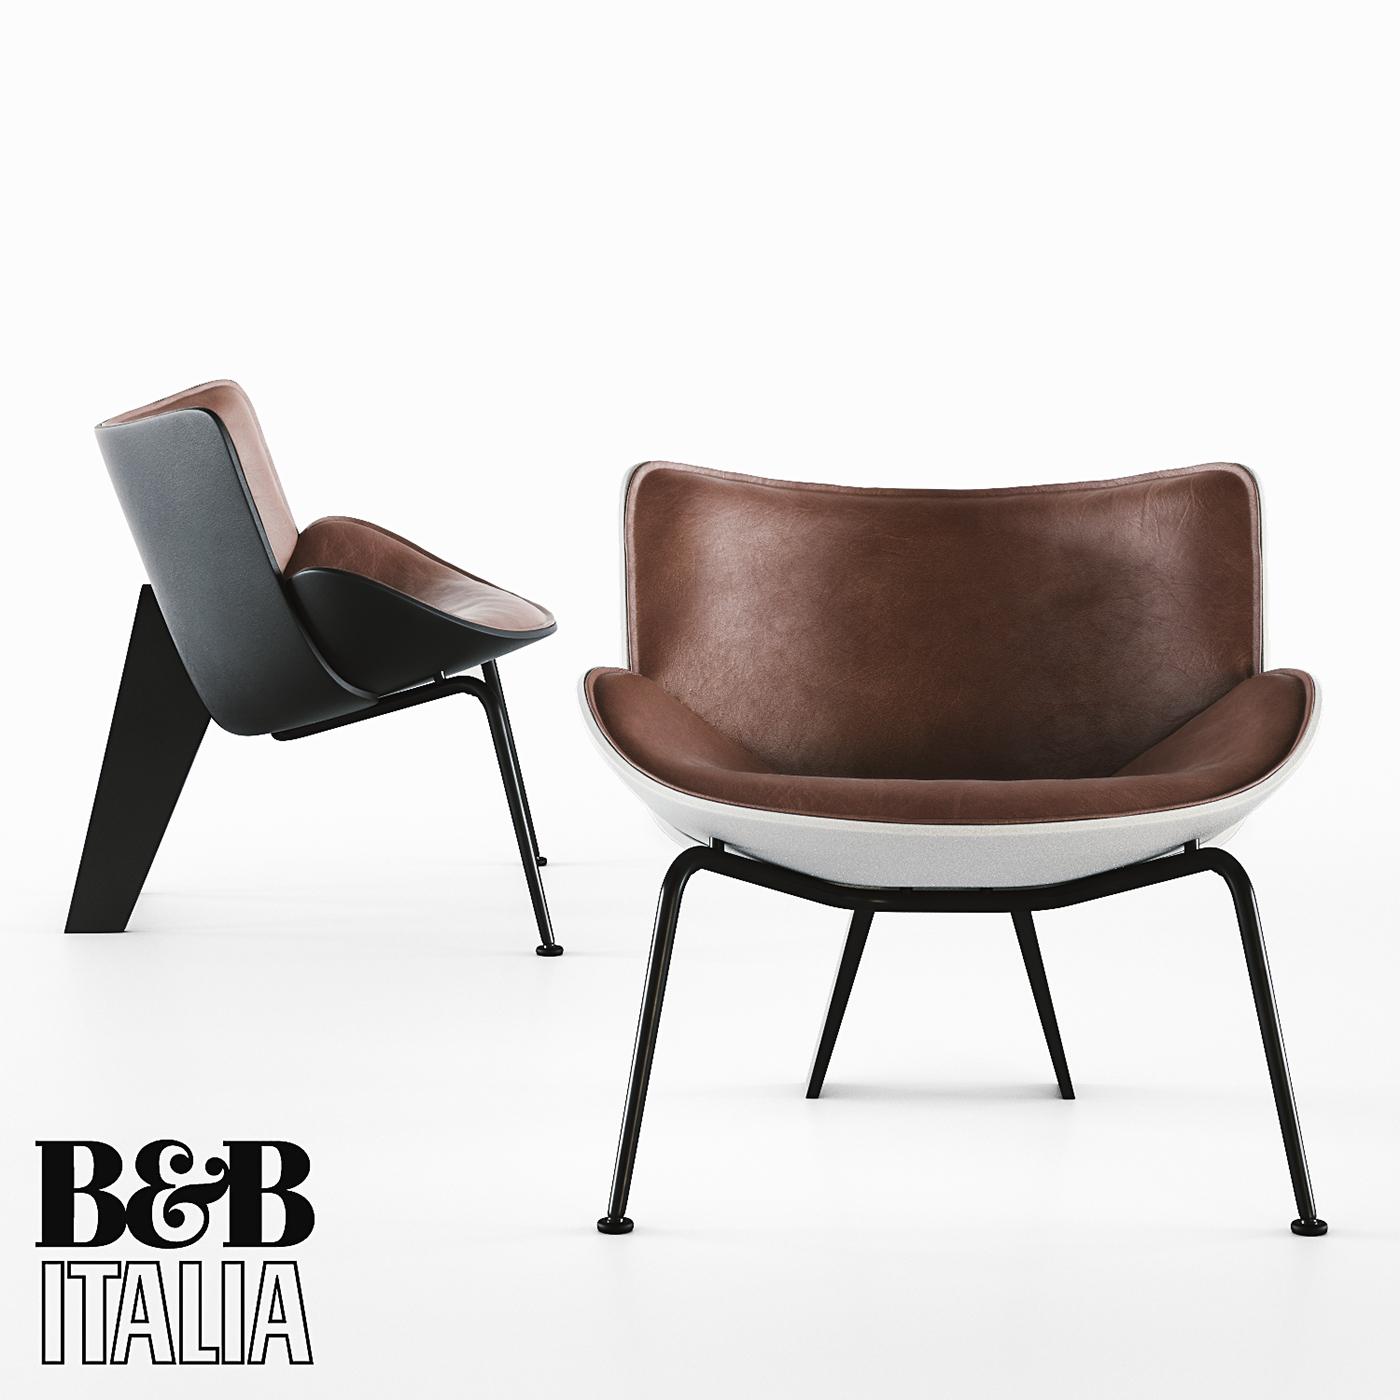 3d model armchair b b italia do naru on behance